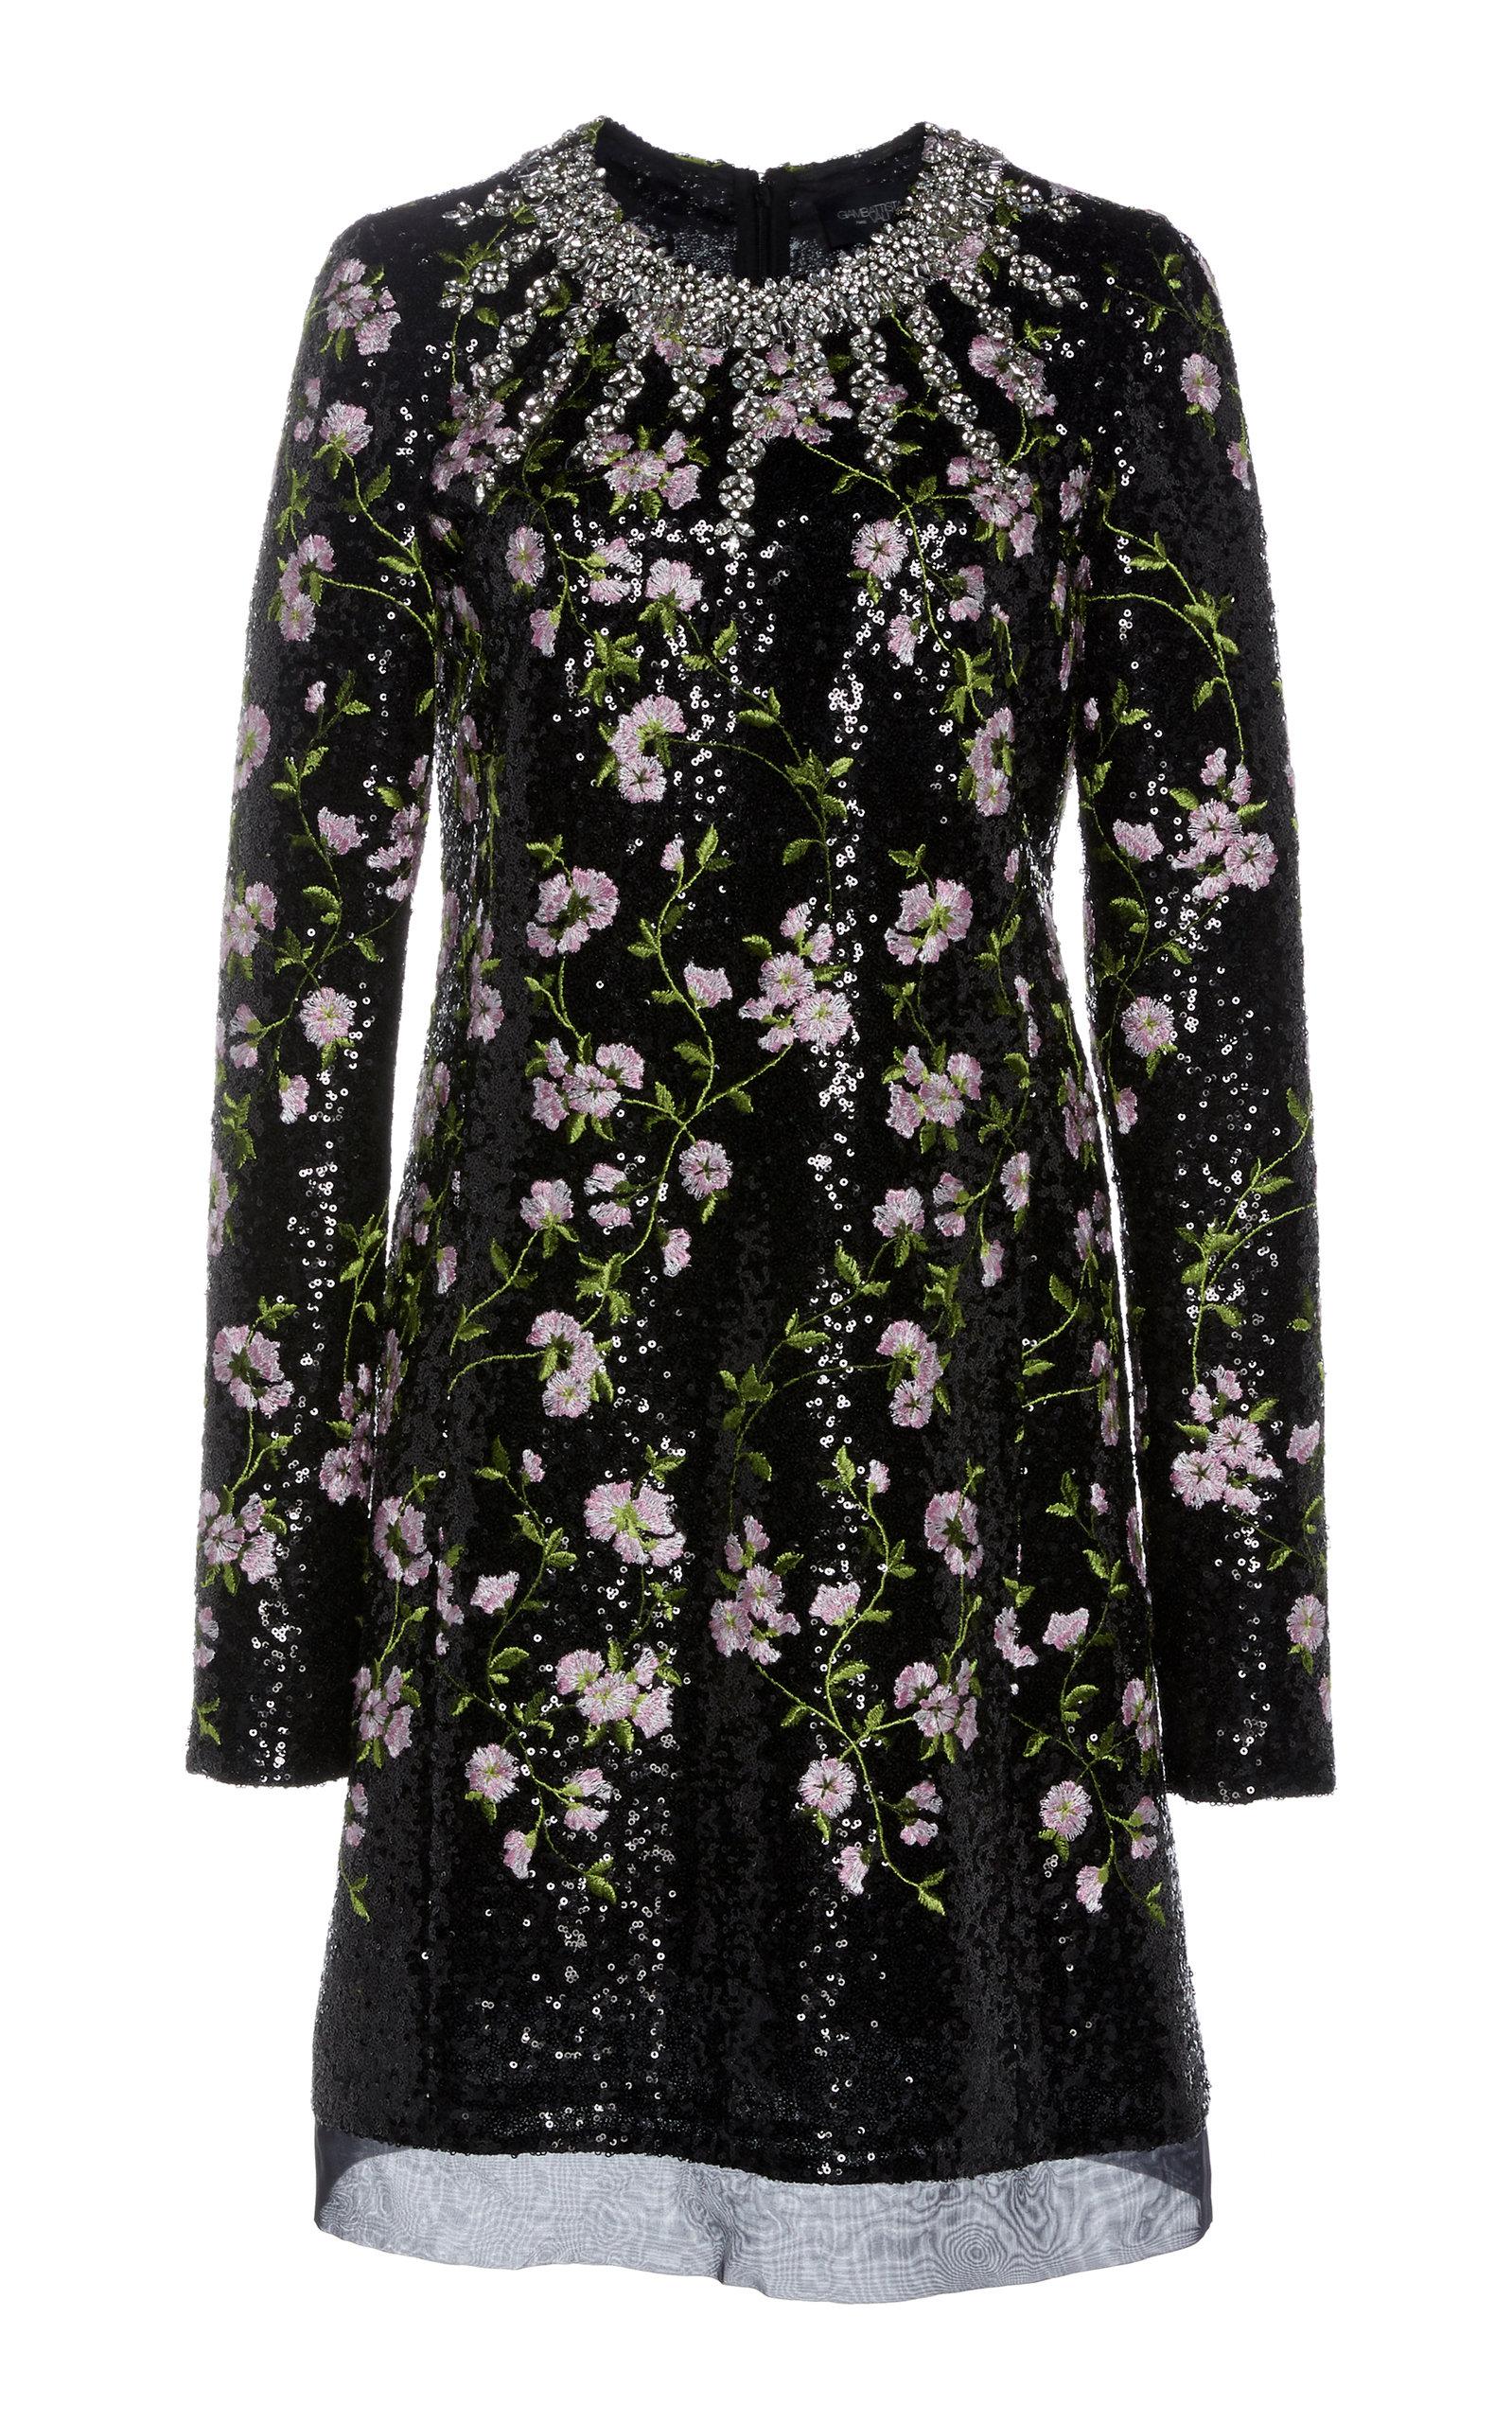 Buy Giambattista Valli Floral-Embroidered Sequined Mini Dress online, shop Giambattista Valli at the best price